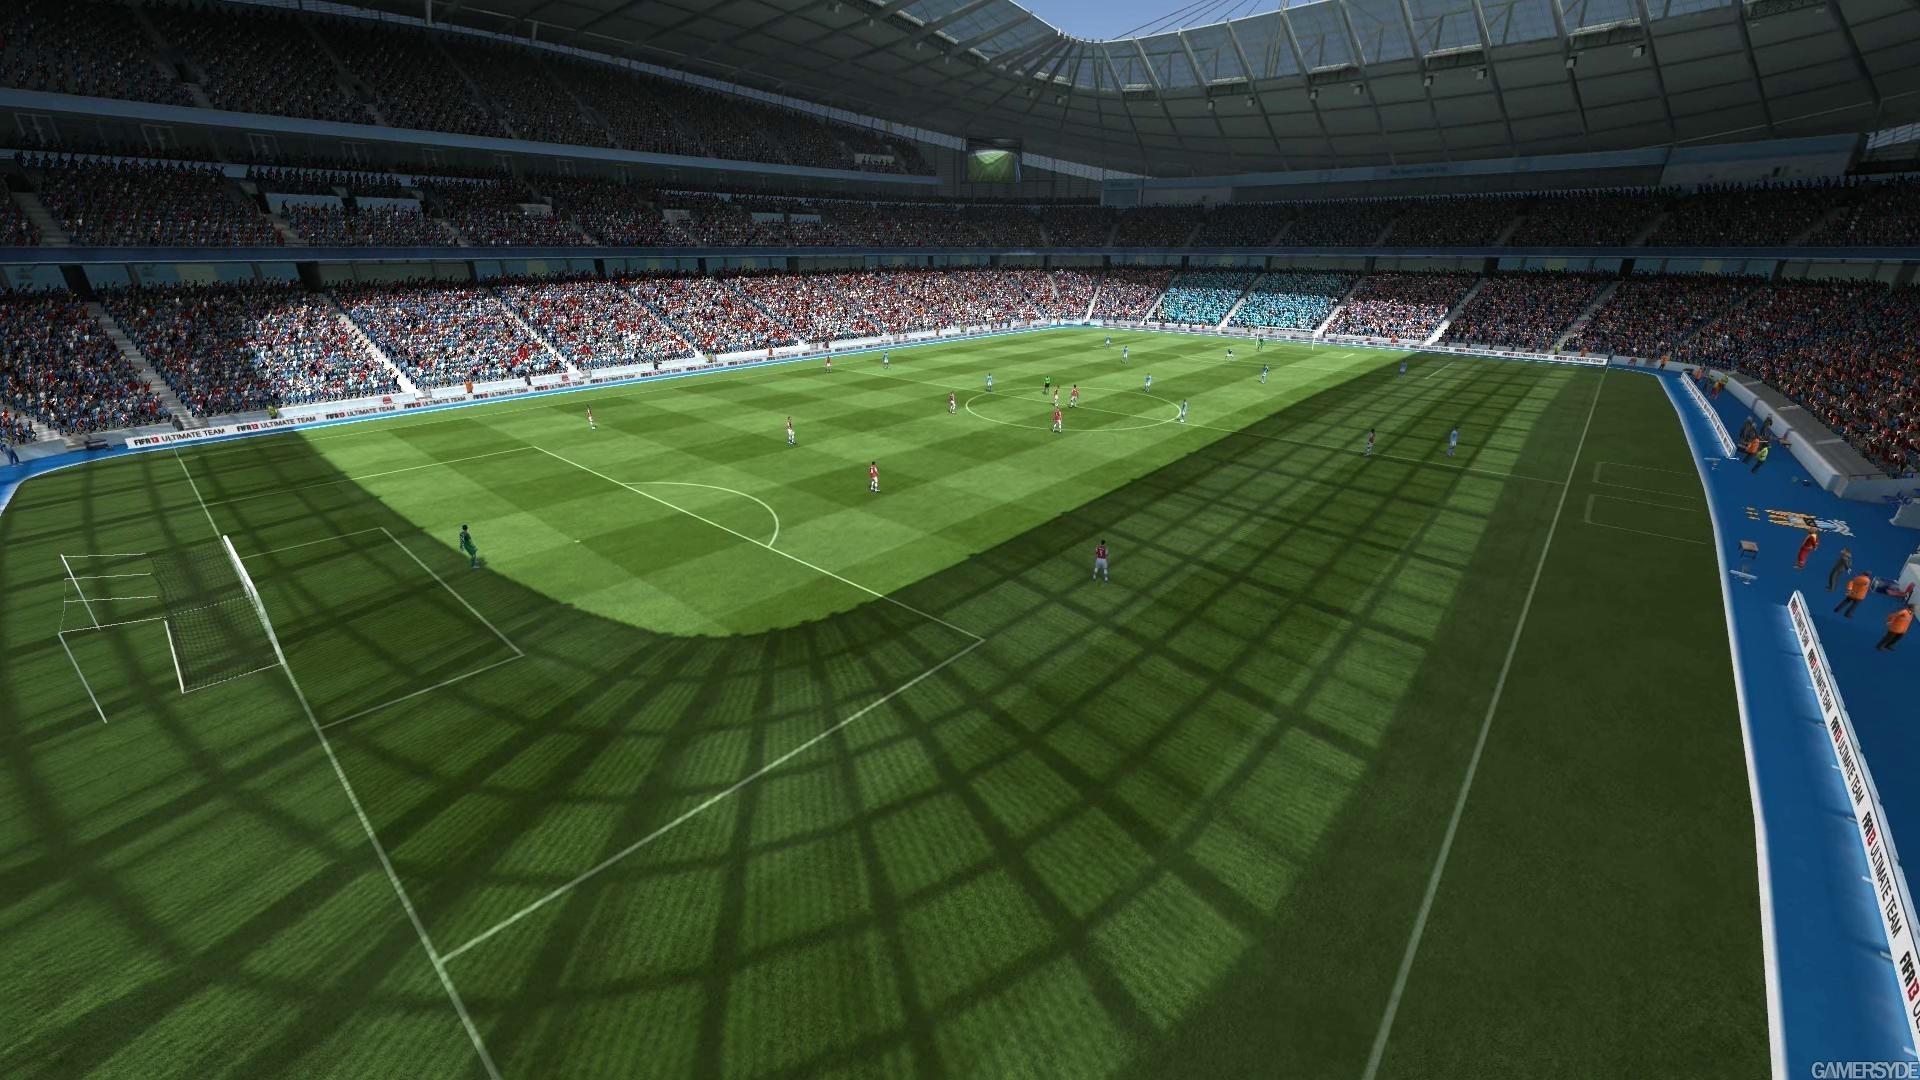 image fifa 13 20261 2509 0011 تصاویر جدید از بازی FIFA 13